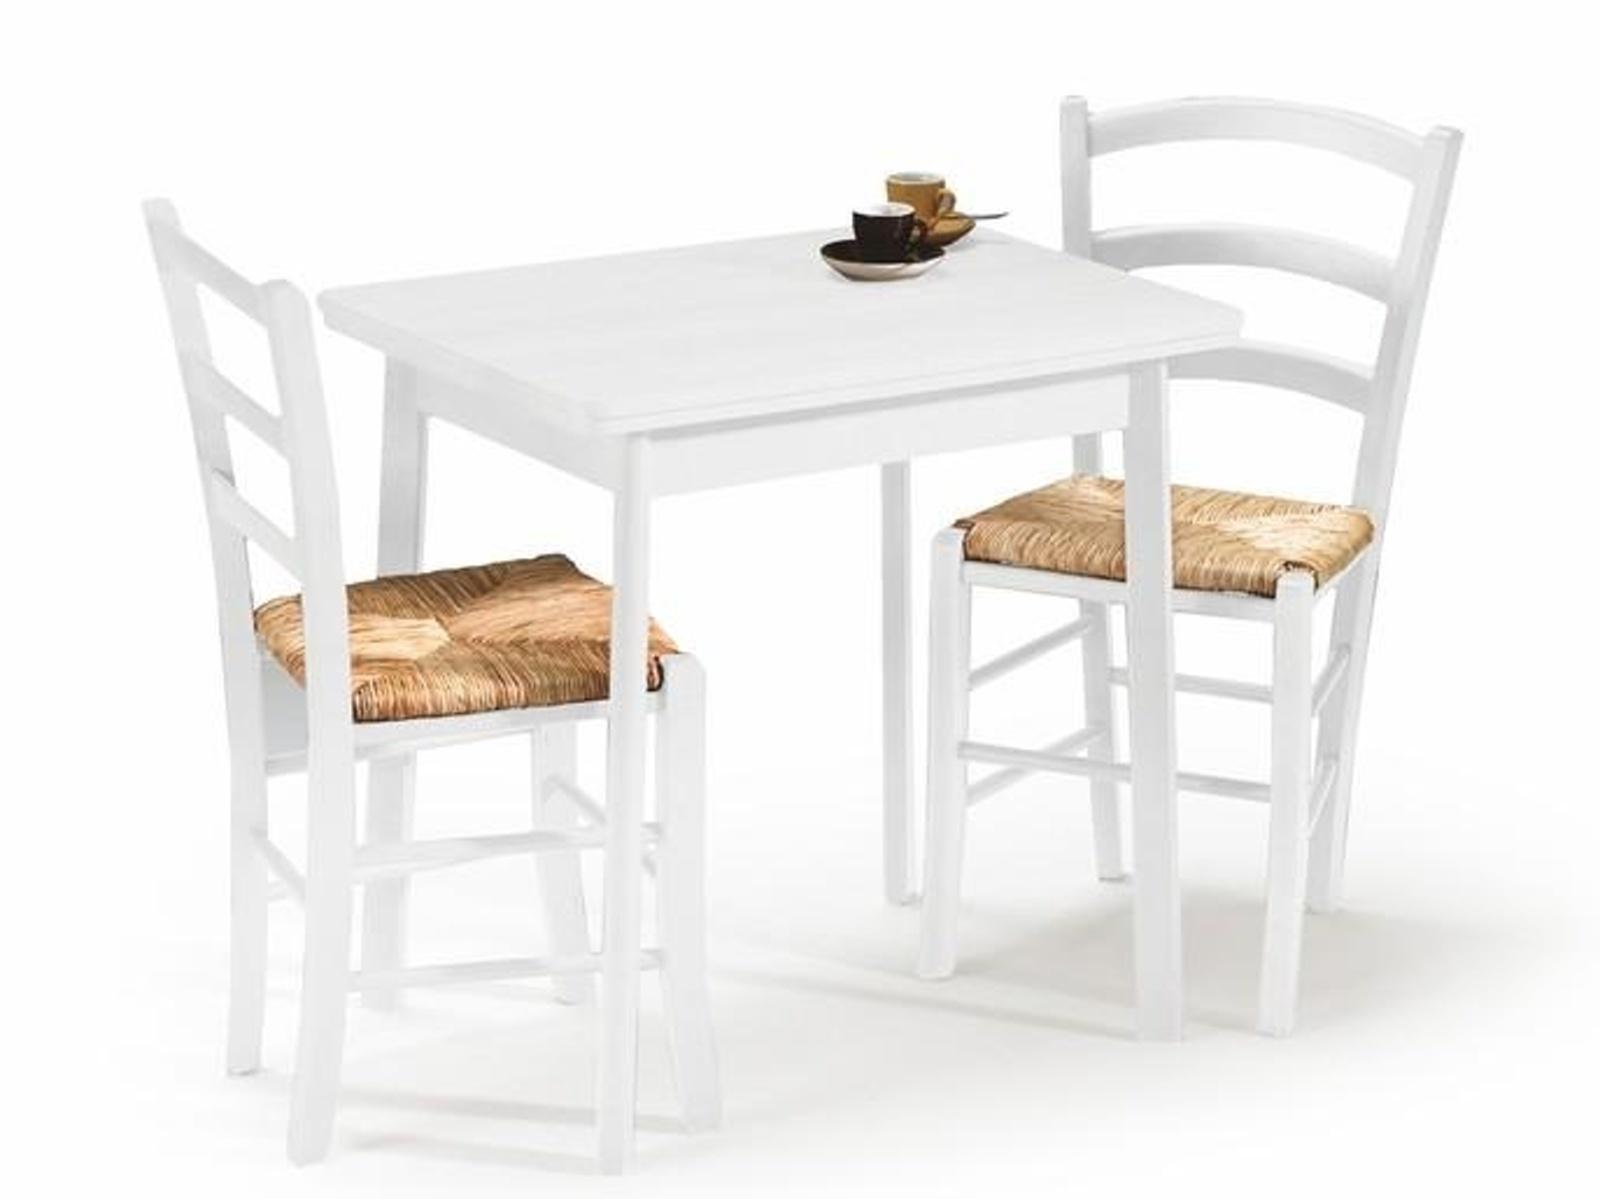 Halmar Jídelní stůl rozkládací ENTER, bílý